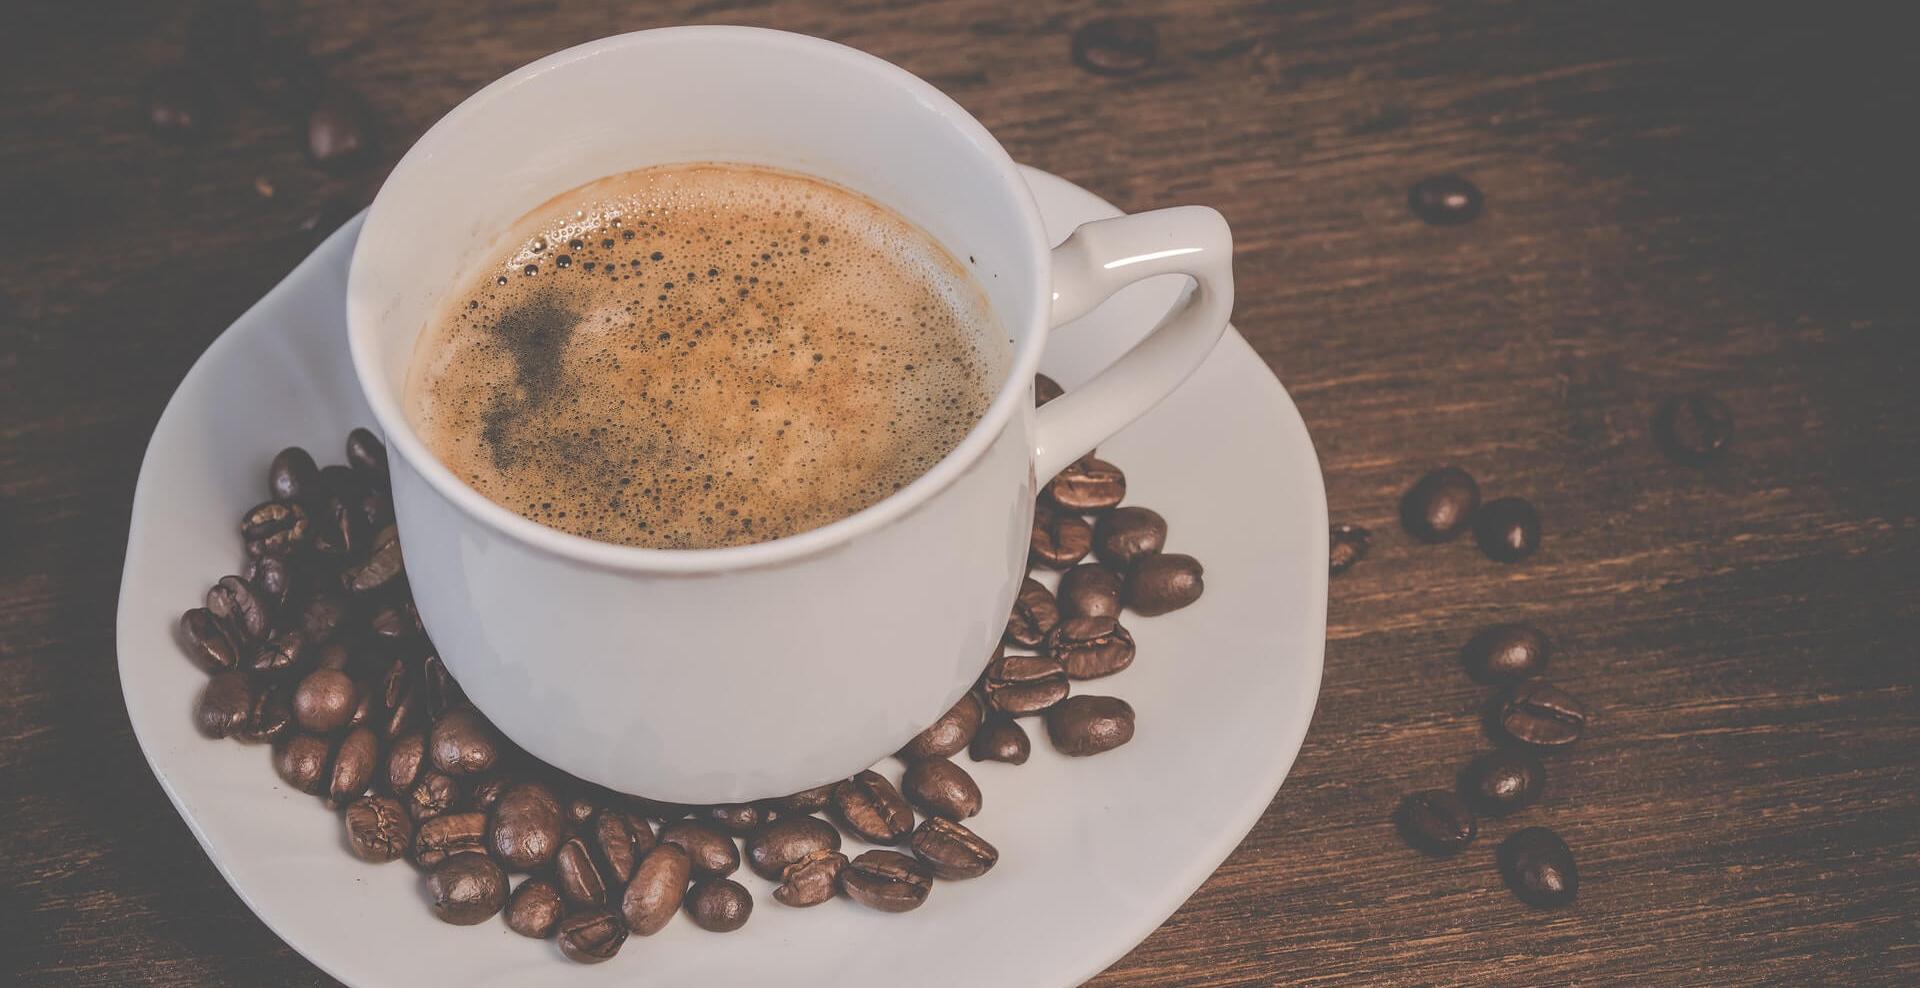 miele kaffeevollautomat header